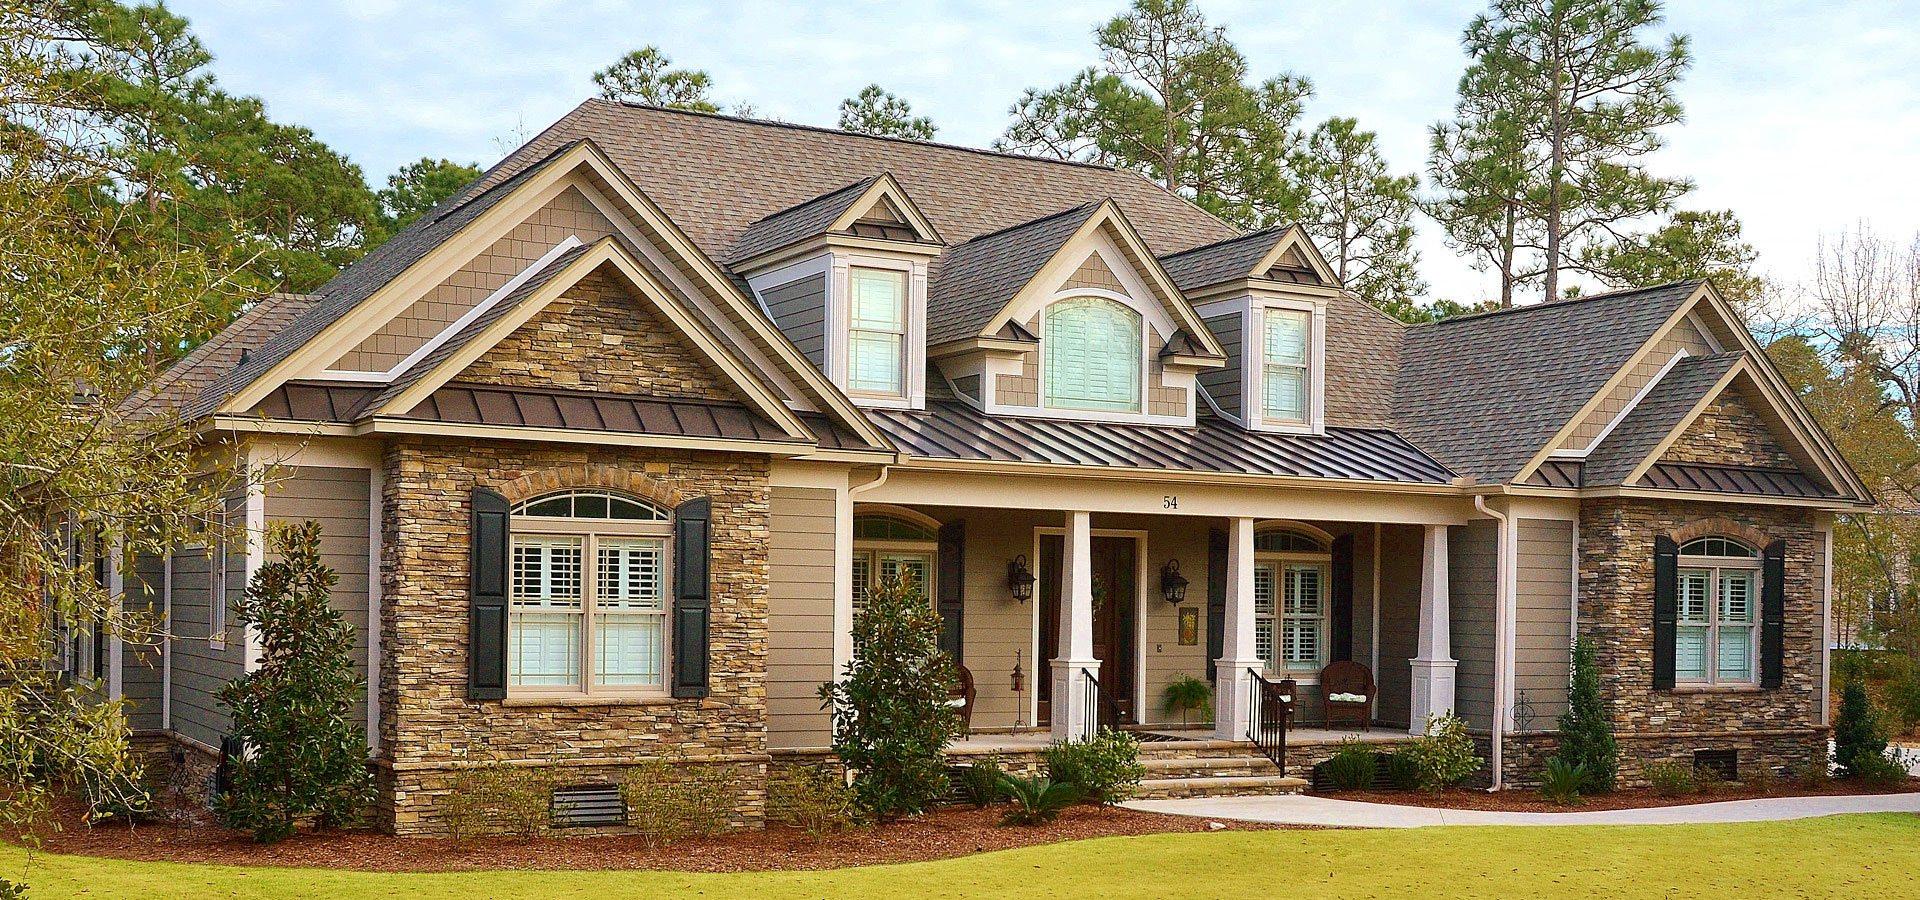 poulin custom builders full in house design - Home Design Construction